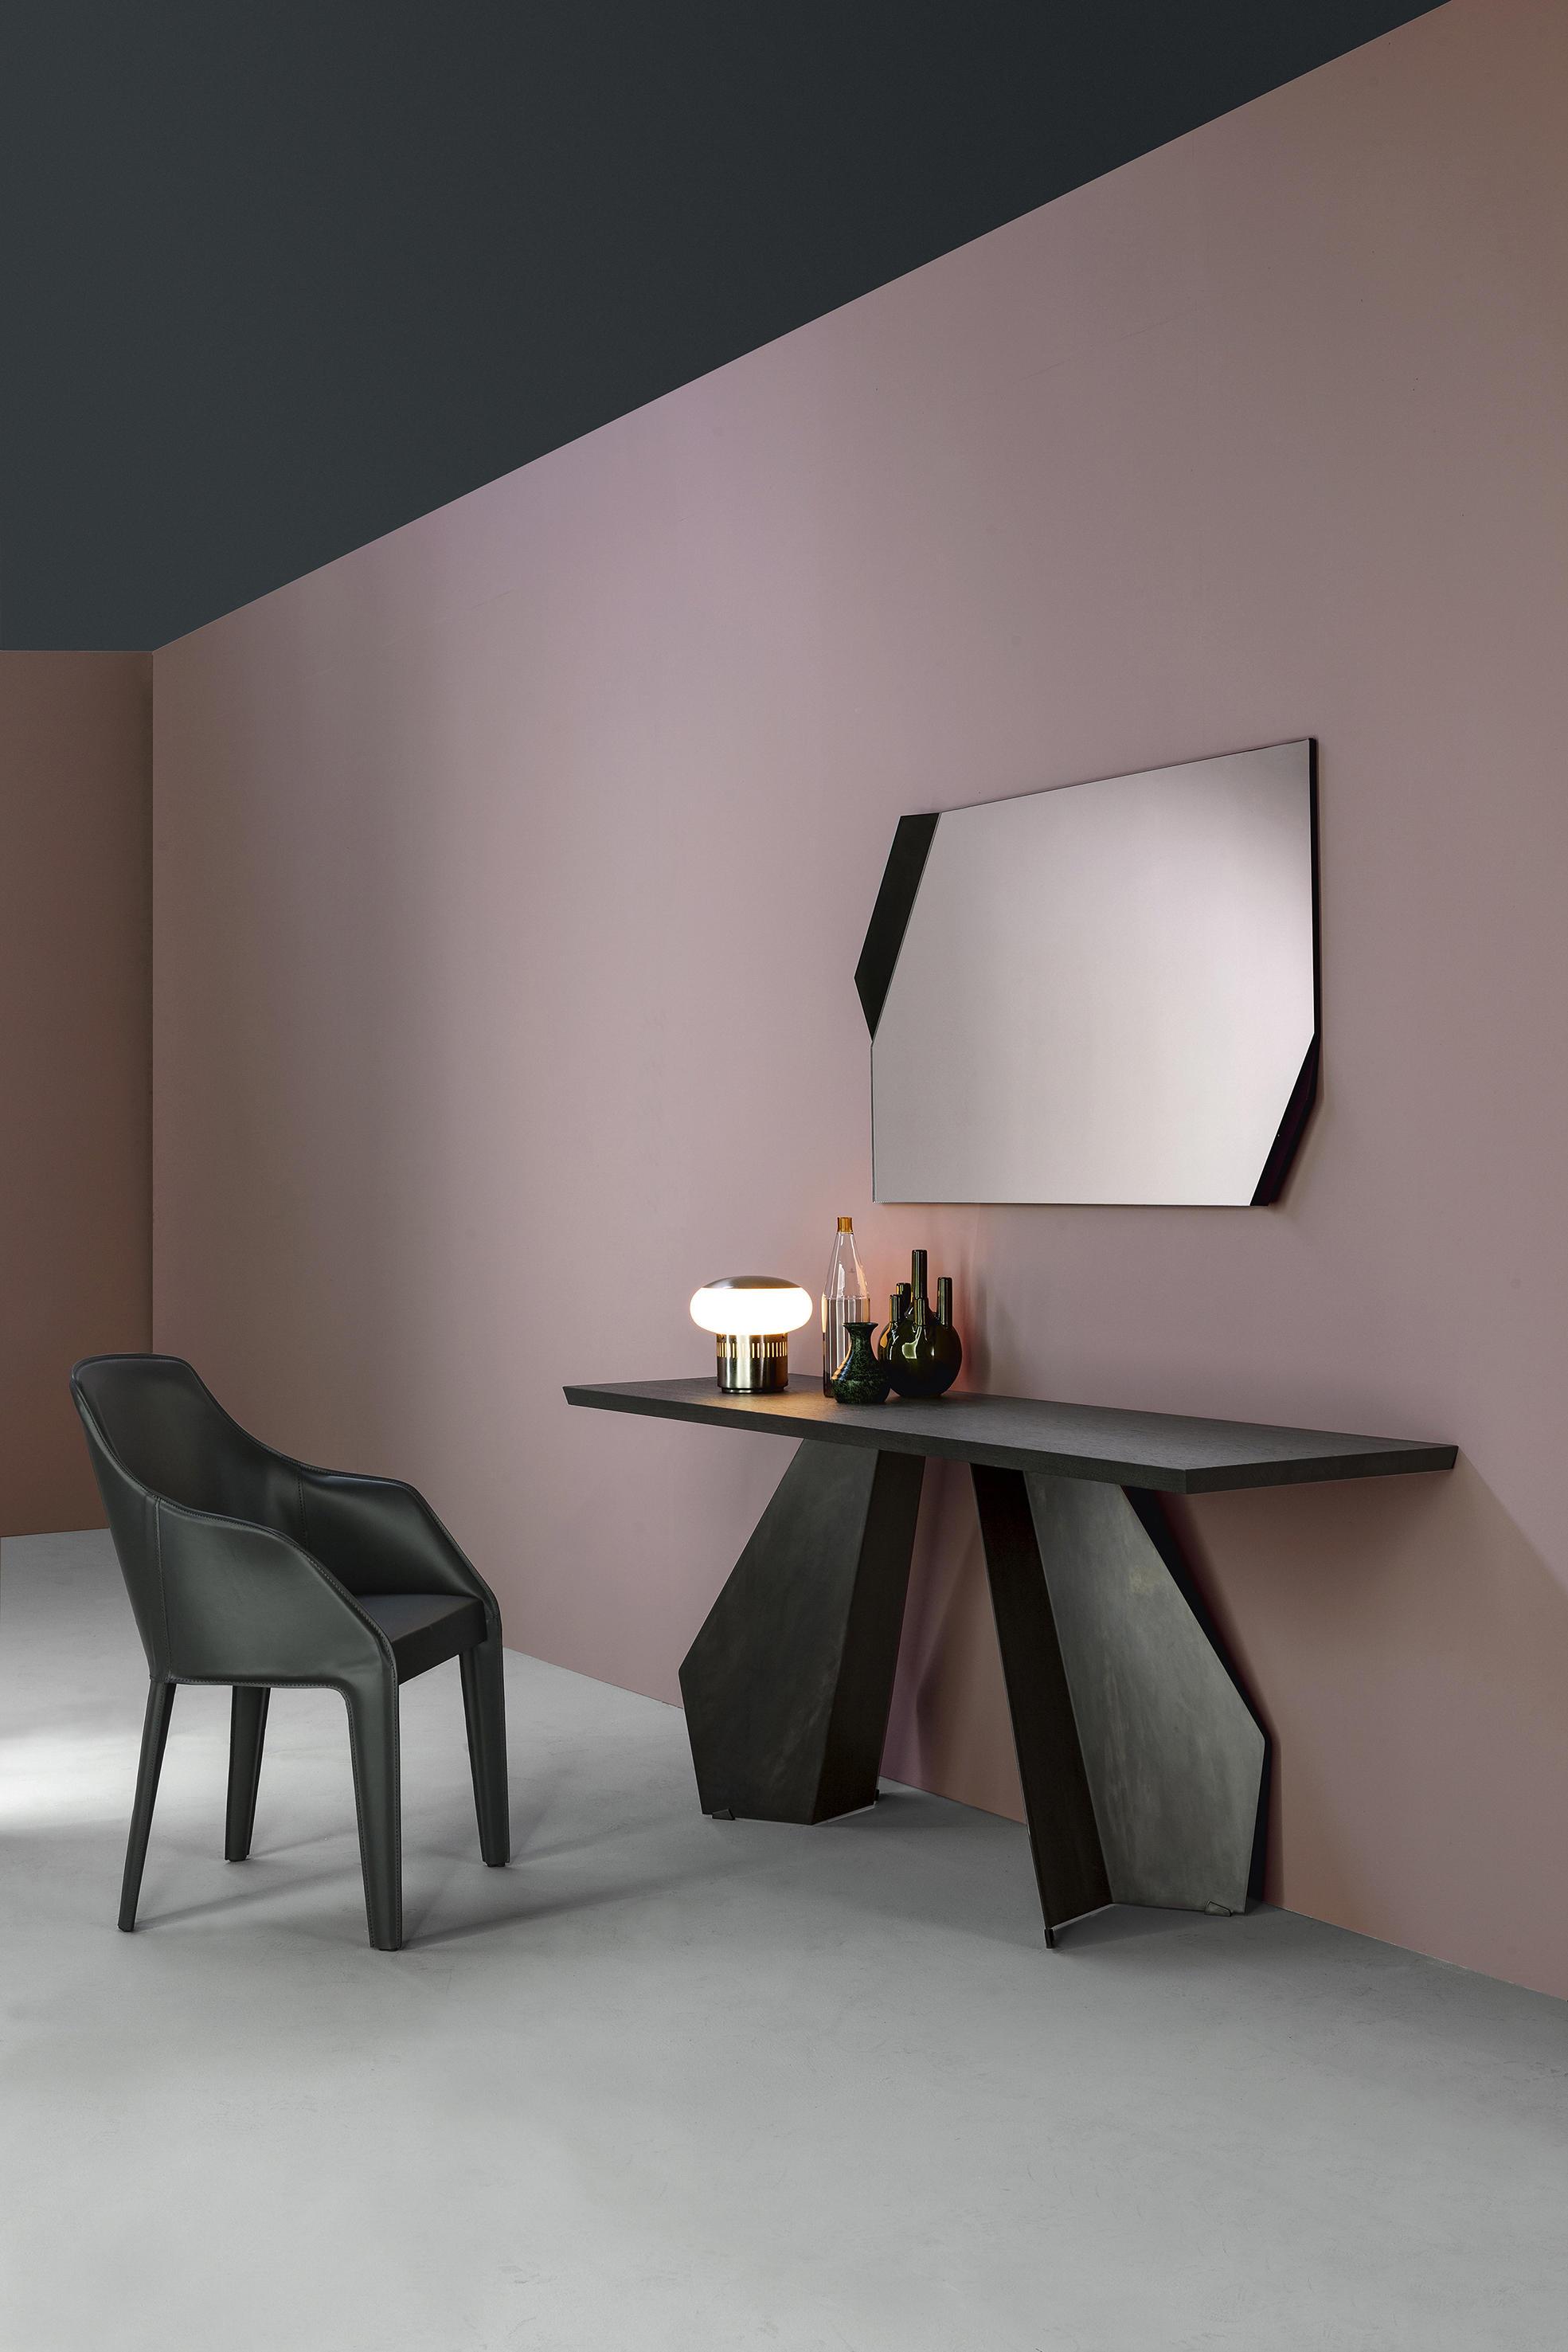 Origami Table by Gino Carollo for Bonaldo